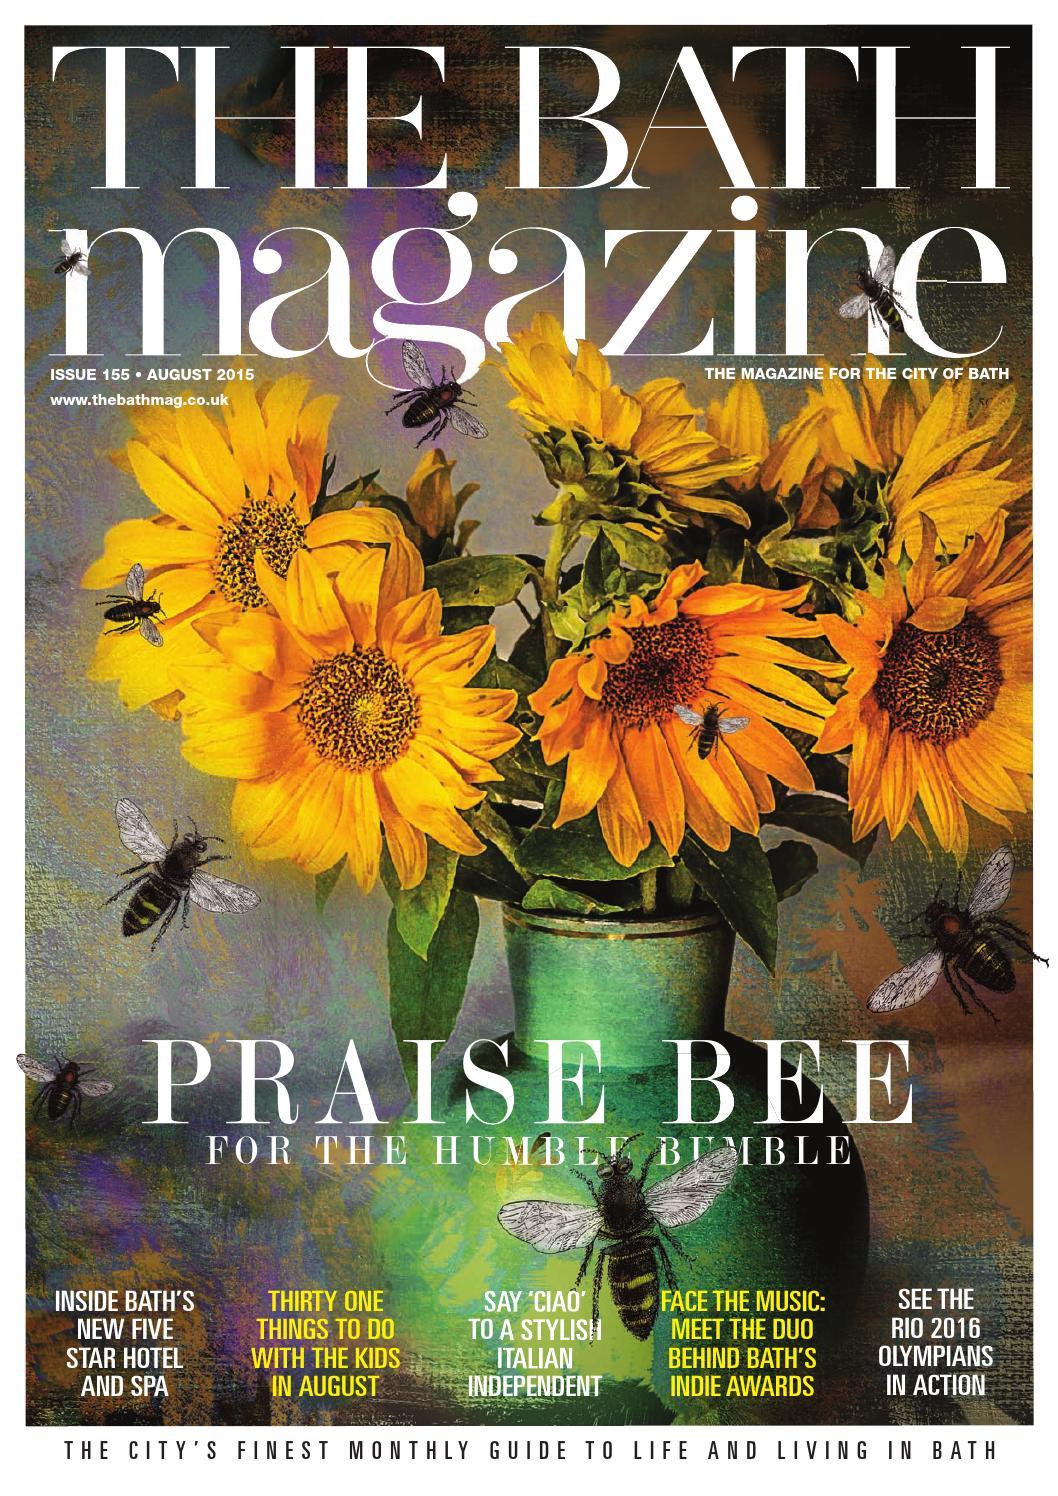 The Bath Magazine August 2015 by MC Publishing Limited - issuu